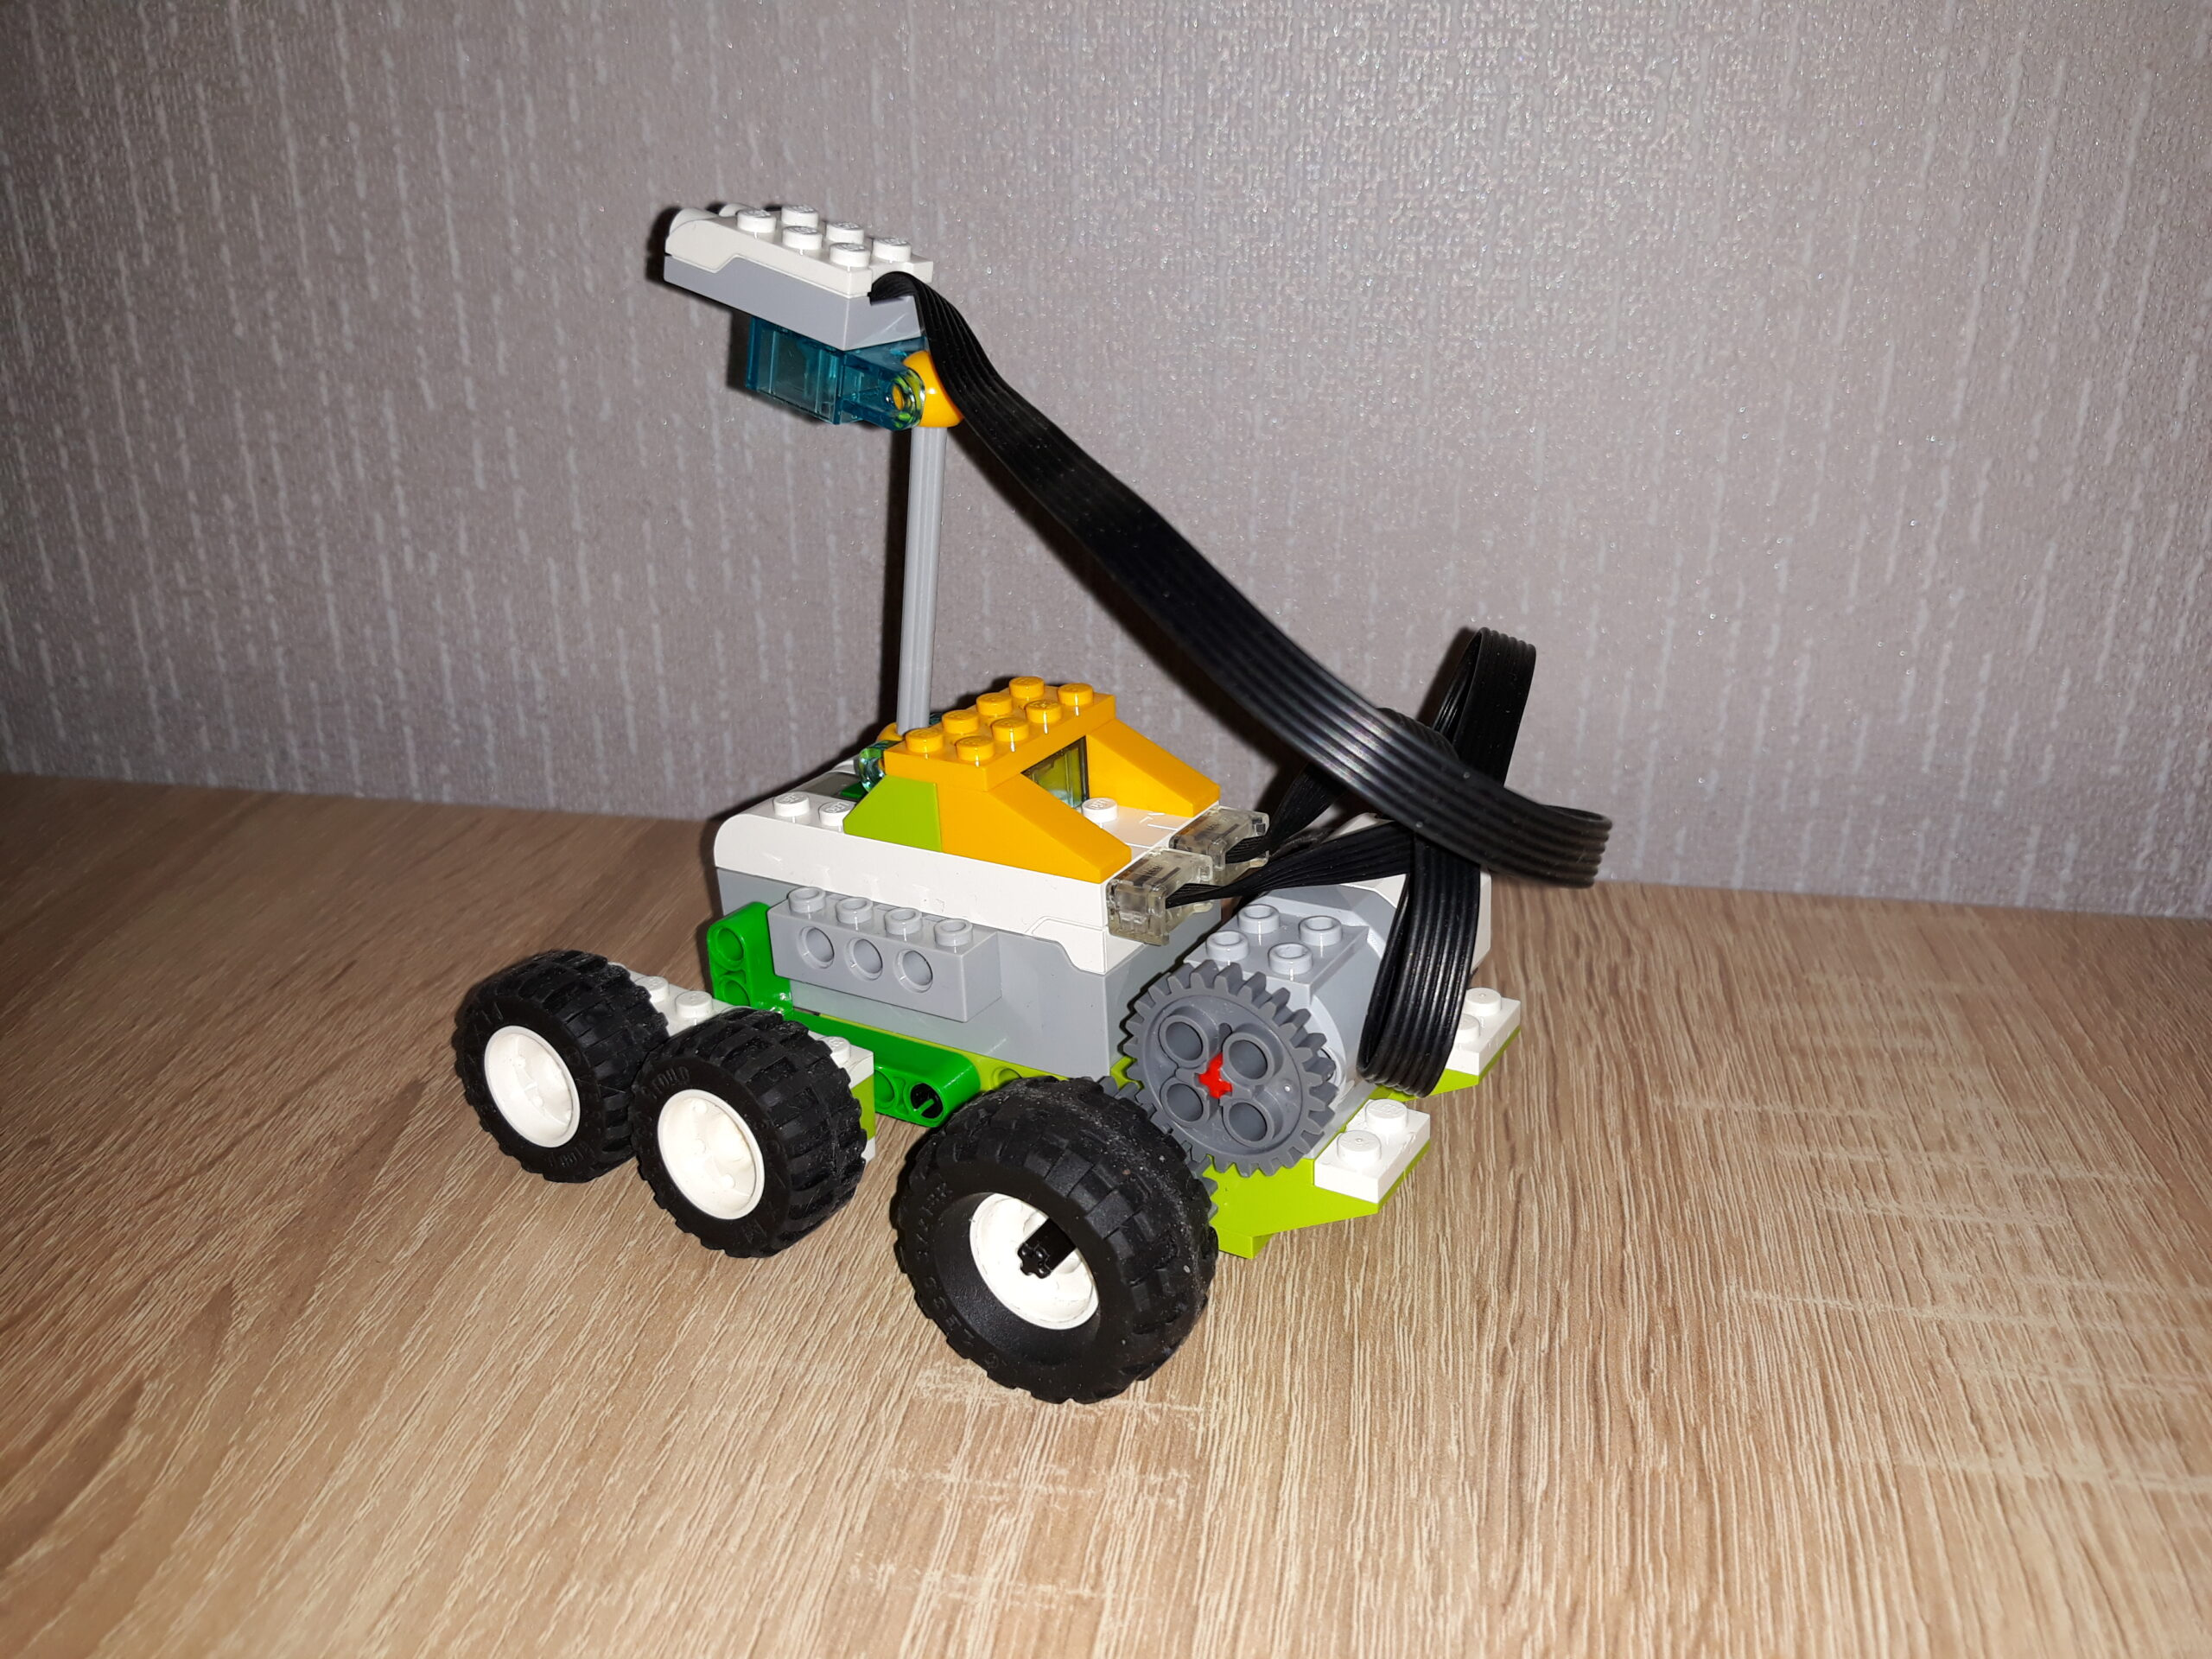 Итог инструкция по сборке из набора LEGO Education WeDo 2.0 Марсоход